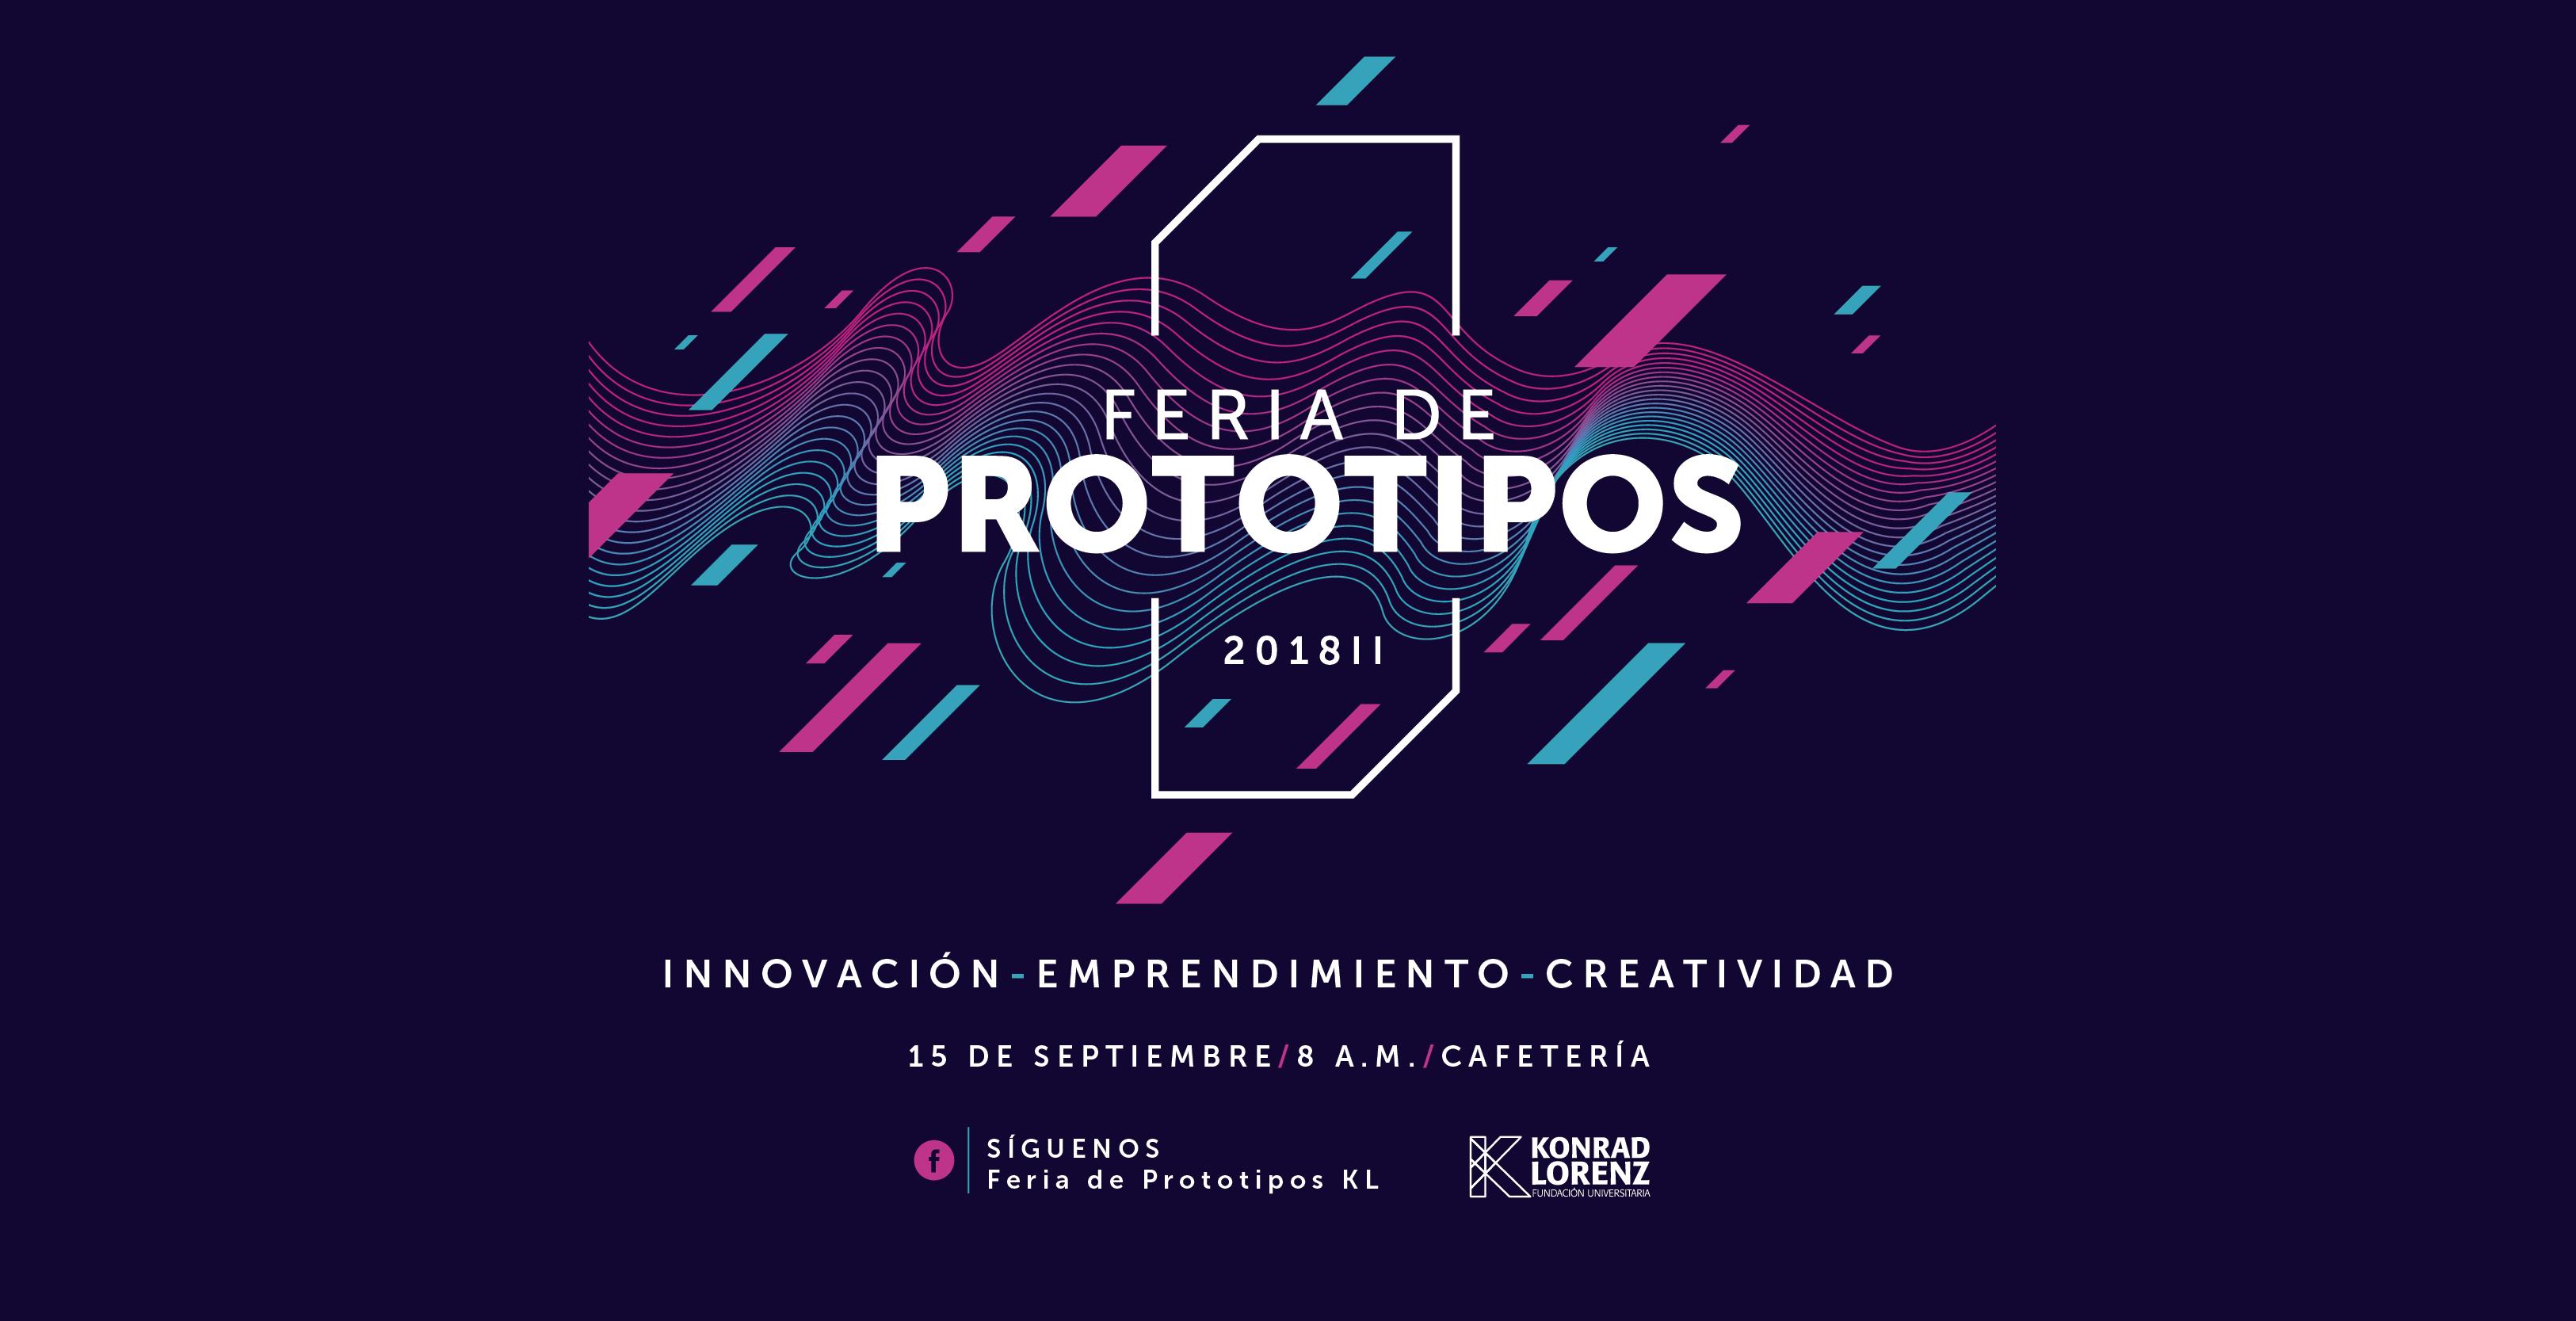 Feria de Prototipos 2018-II